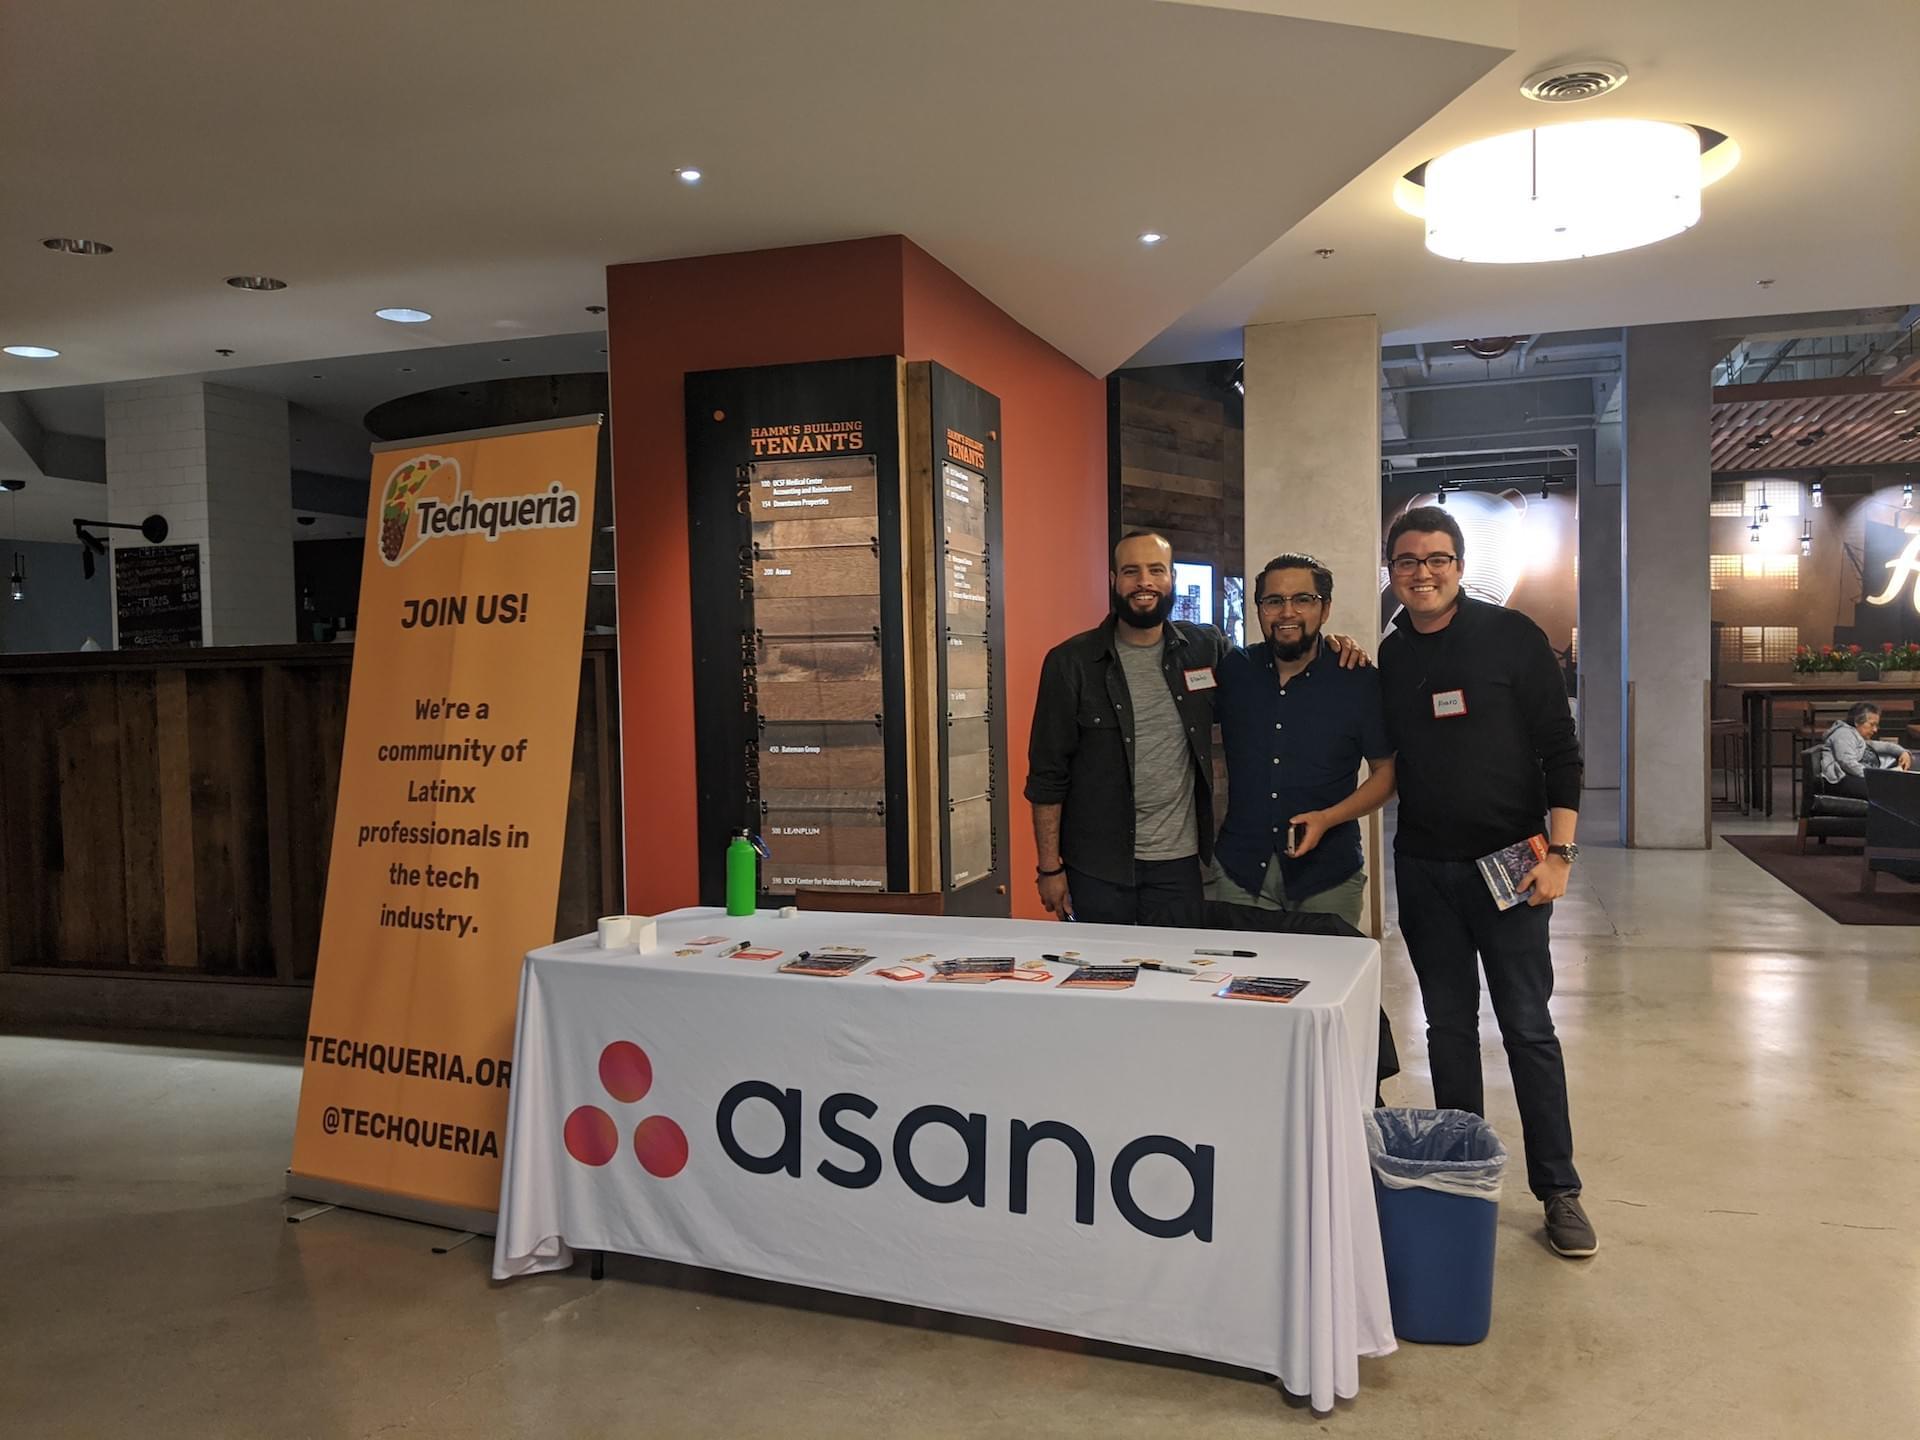 Asana & Techqueria: Partnering to support Latinx engineering mentorship